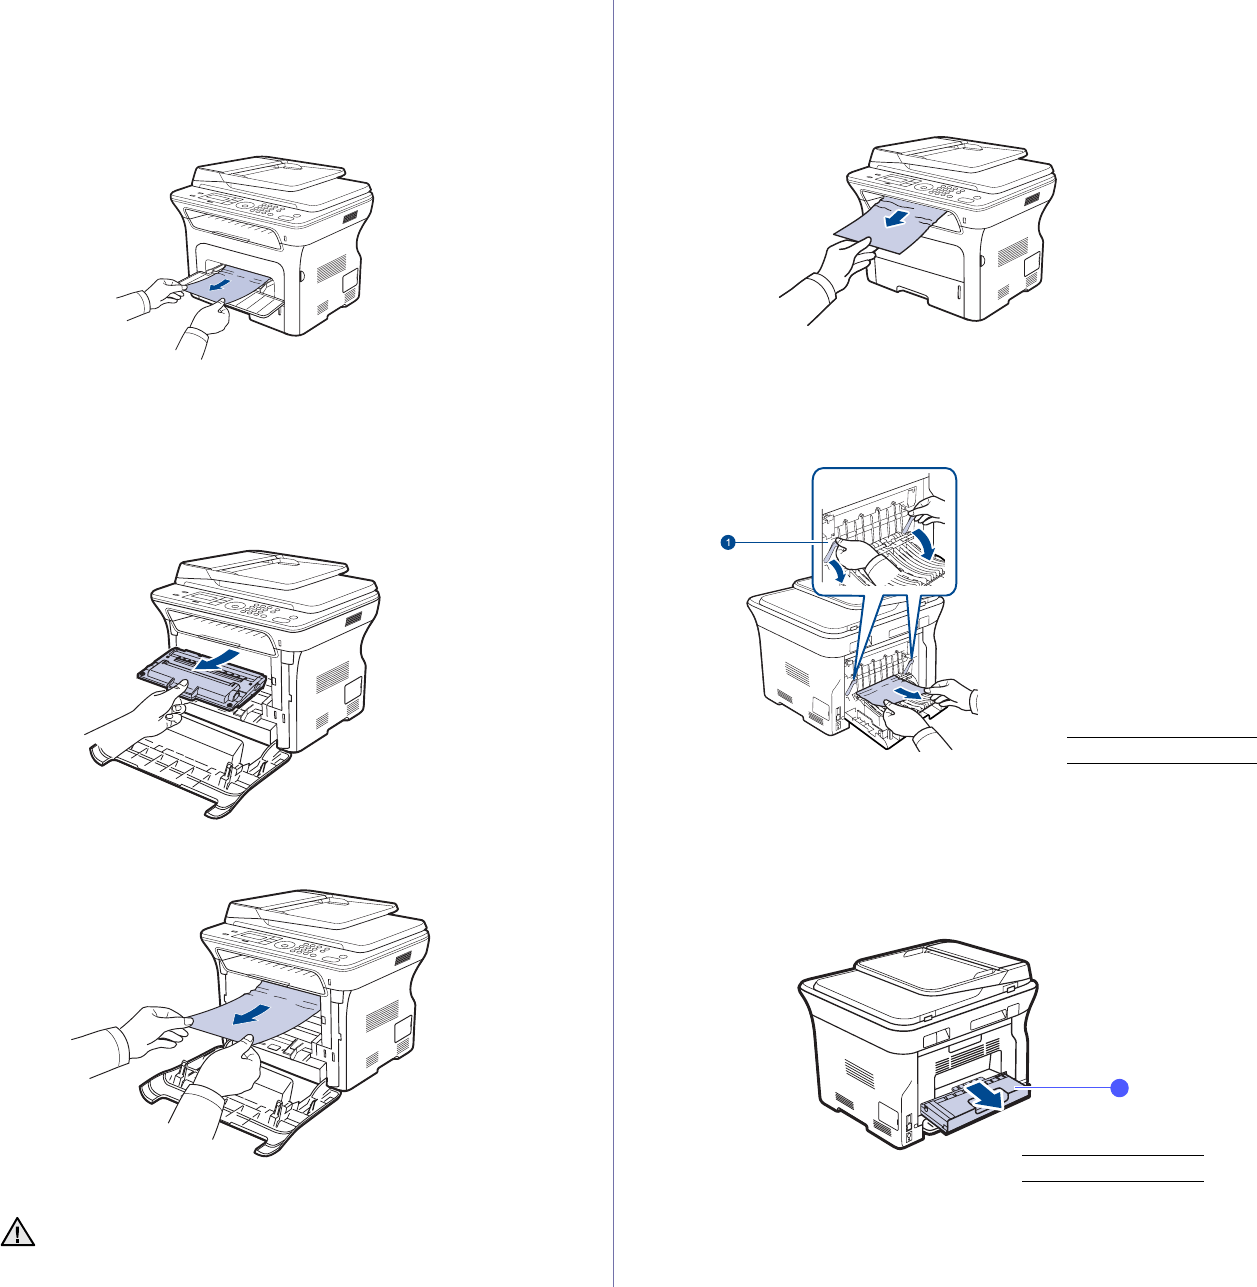 Samsung SCX4826FN, SCX-4x26 In the manual tray, In the